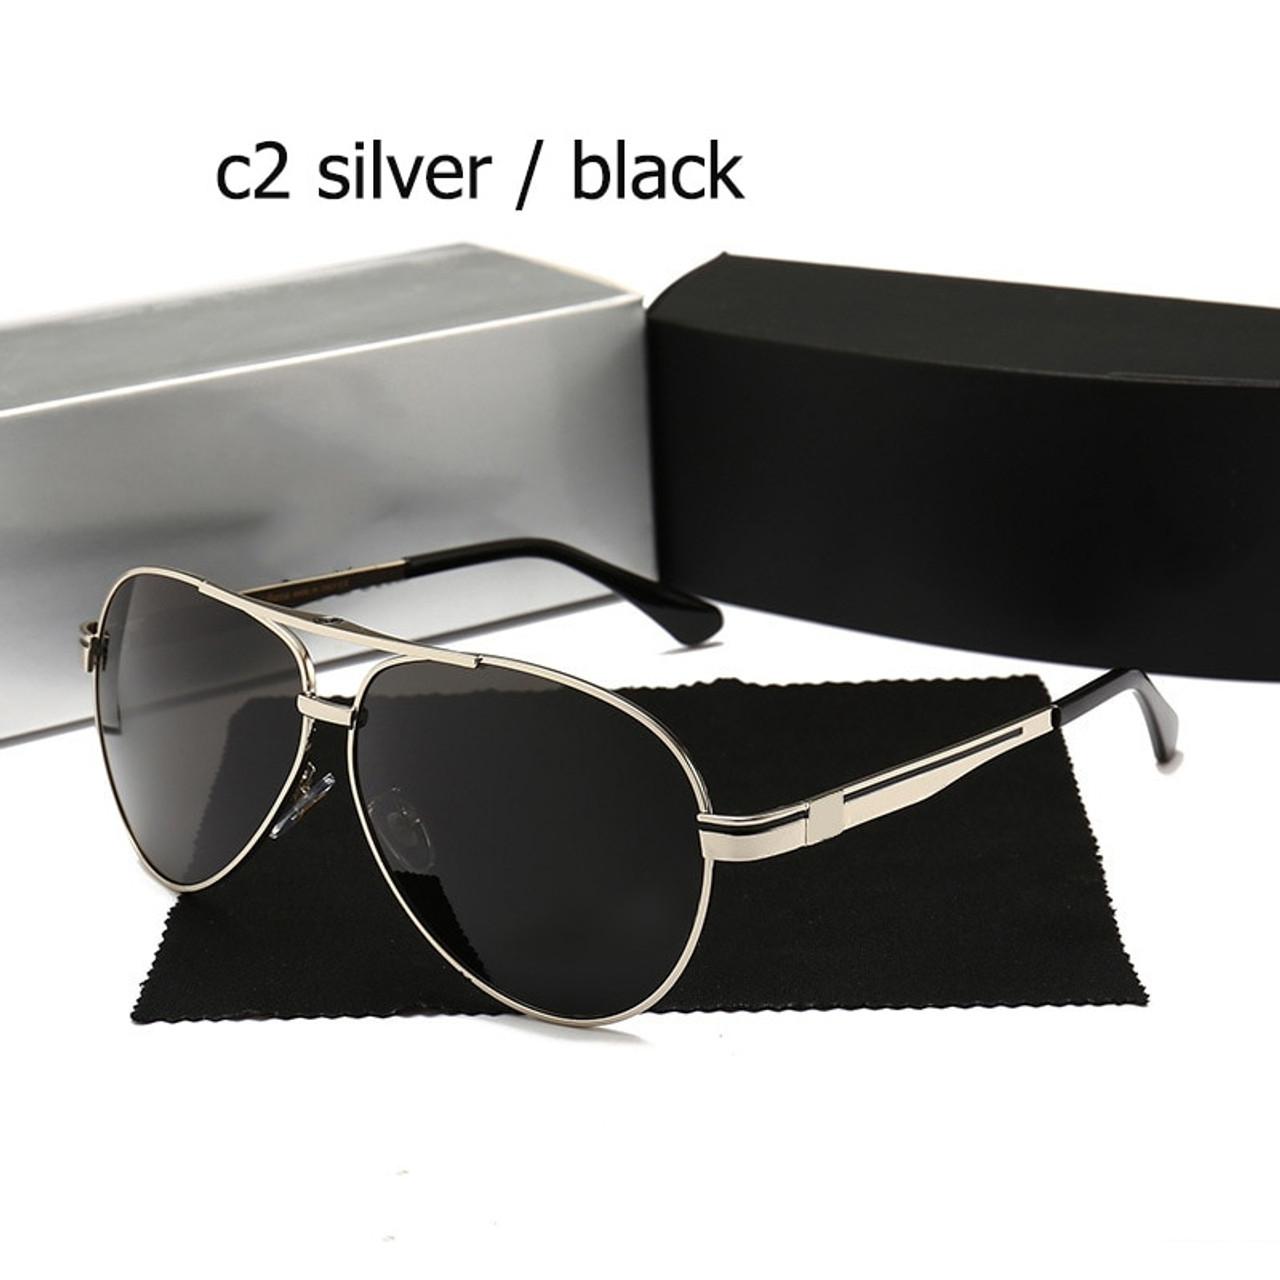 84ae2630dc94 NEW Polarized Sunglasses Mens Mercedes Designer SunGlases women Gafas  Hombre Oculos De Sol for Men s Driving ...